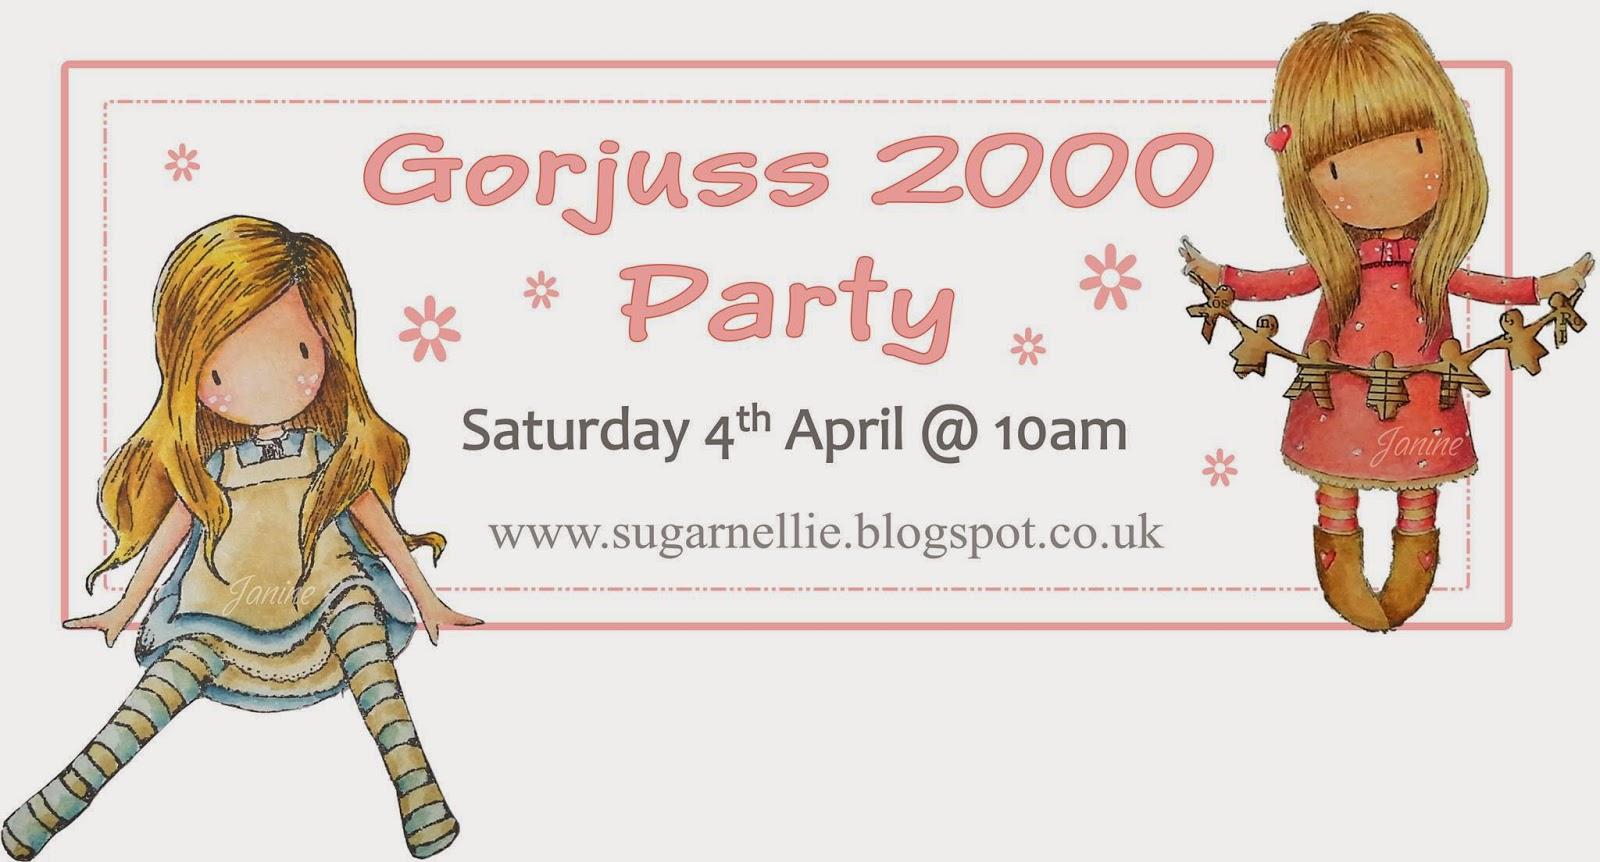 http://sugarnellie.blogspot.ca/